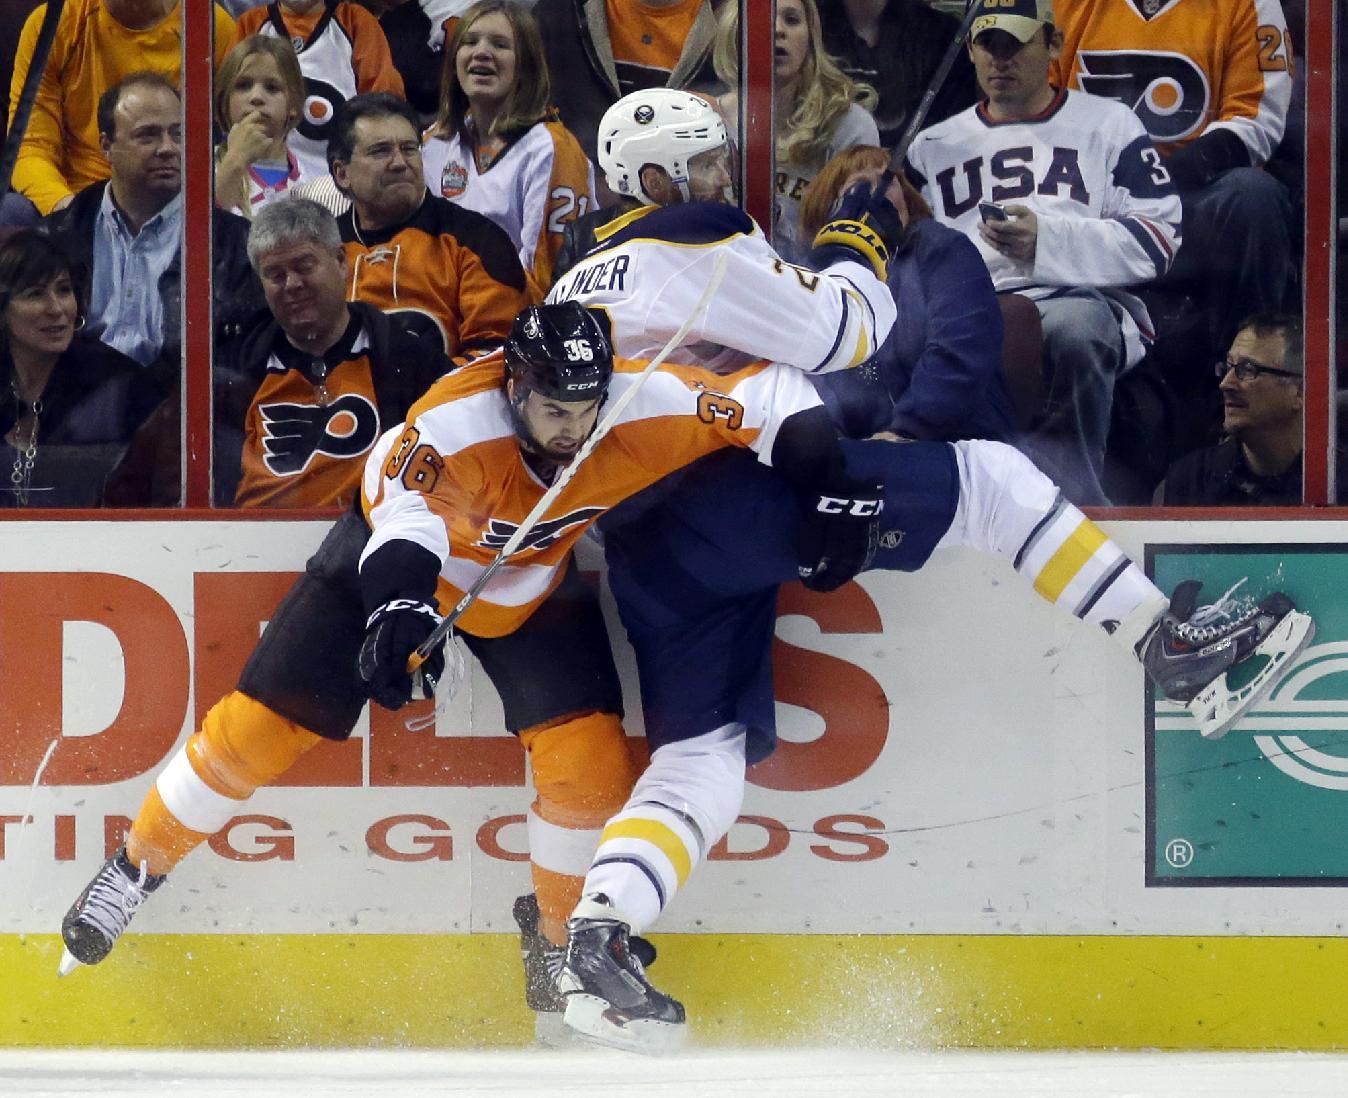 Philadelphia Flyers' Zac Rinaldo, left, collides with Buffalo Sabres' Henrik Tallinder, of Sweden, during the first period of an NHL hockey game Thursday, Nov. 21, 2013, in Philadelphia